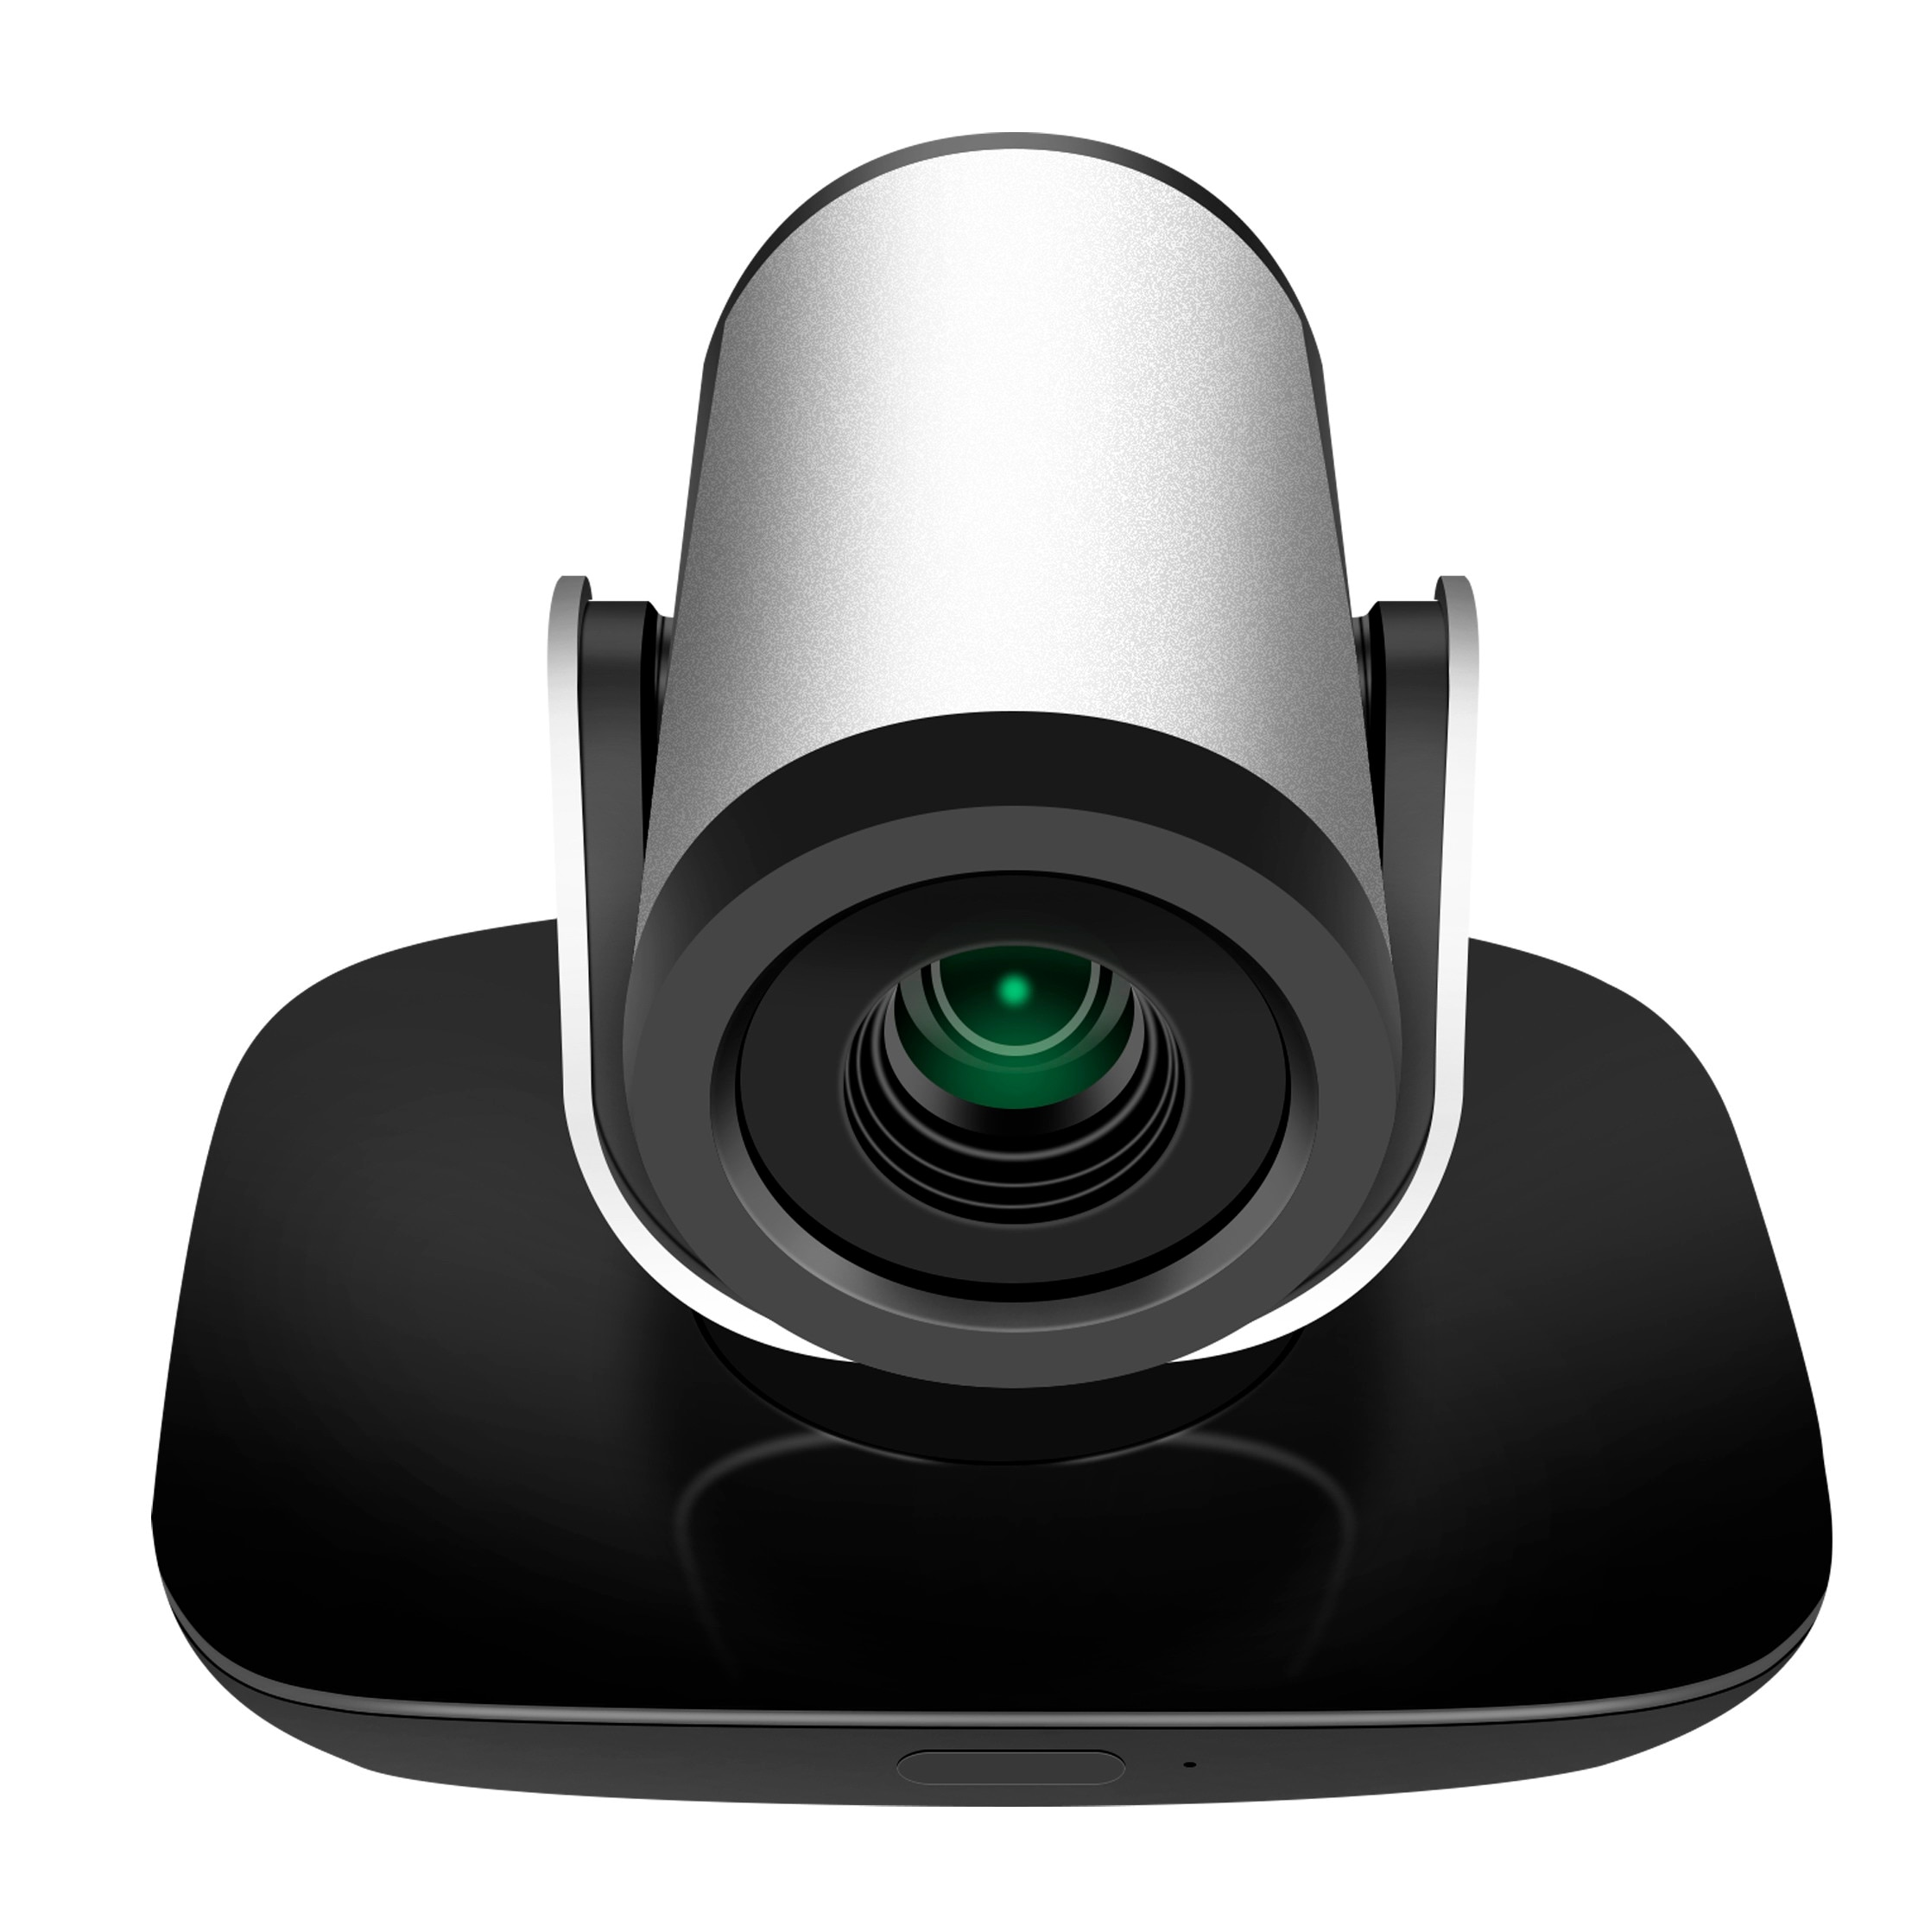 G07-18X PTZ التحكم عن بعد كاميرا فيديو للمؤتمرات